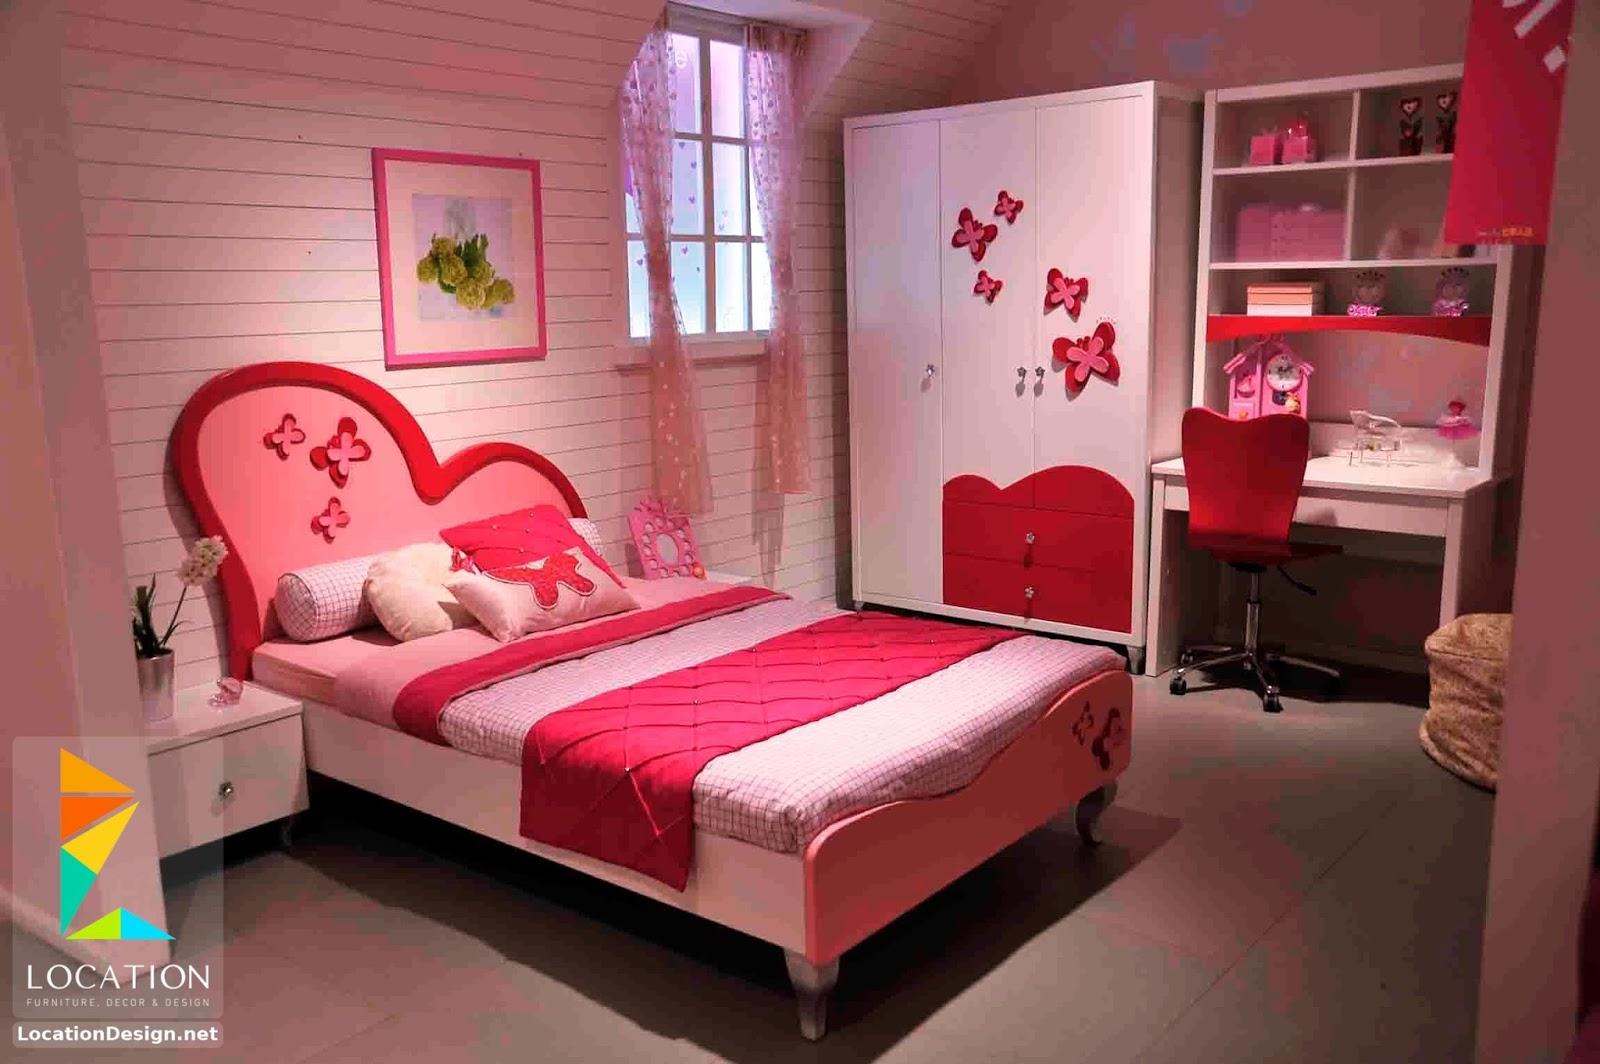 كتالوج صور موديلات غرف اطفال 2018 2019 Bedrooms Egypt